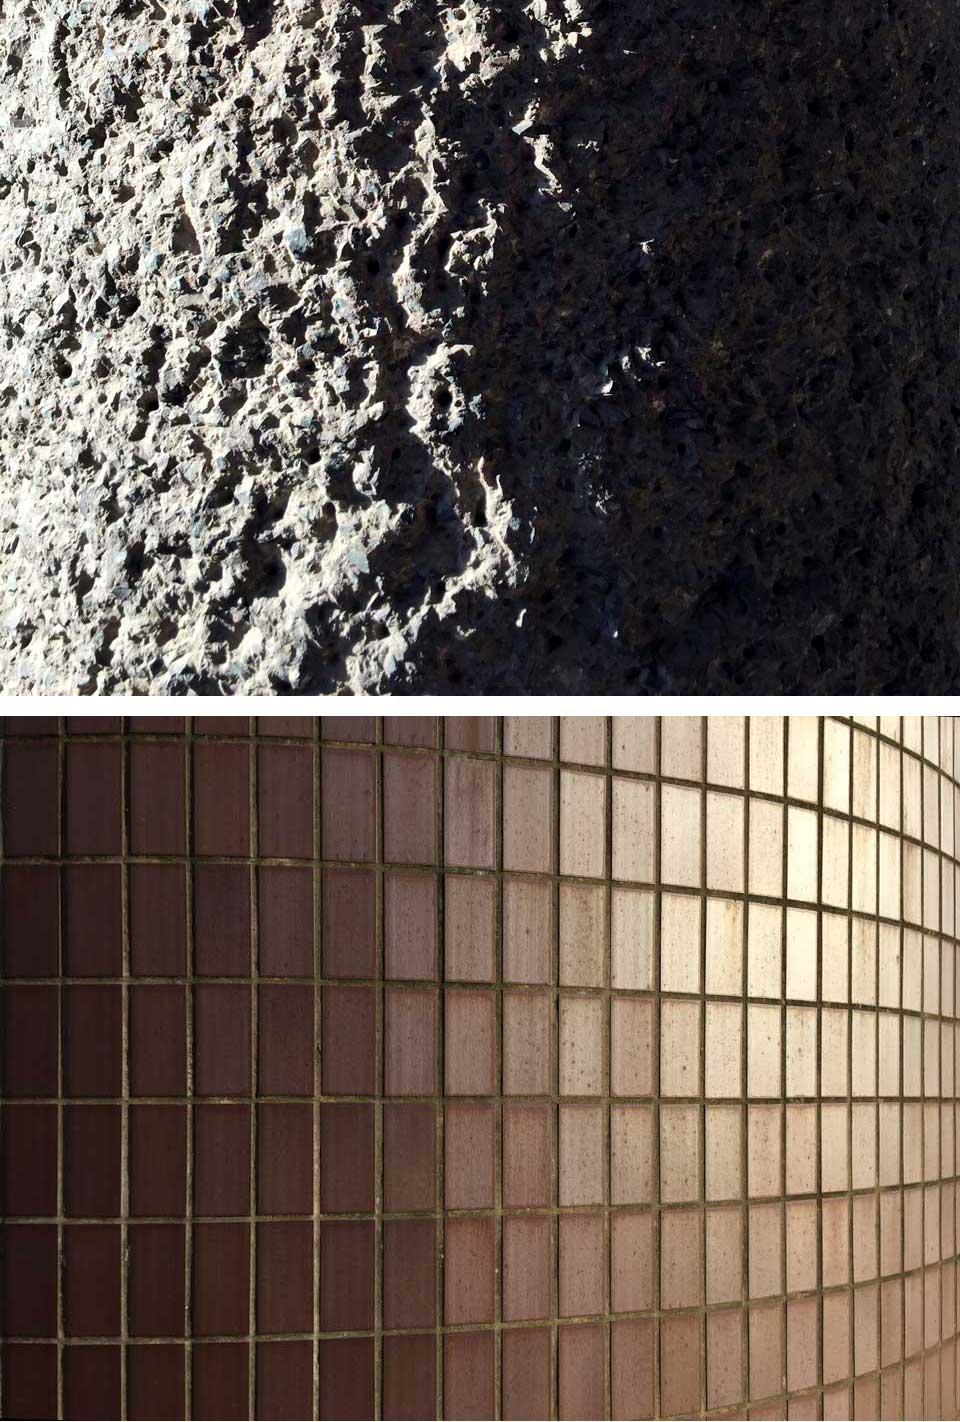 Surfaces, Barbican Image